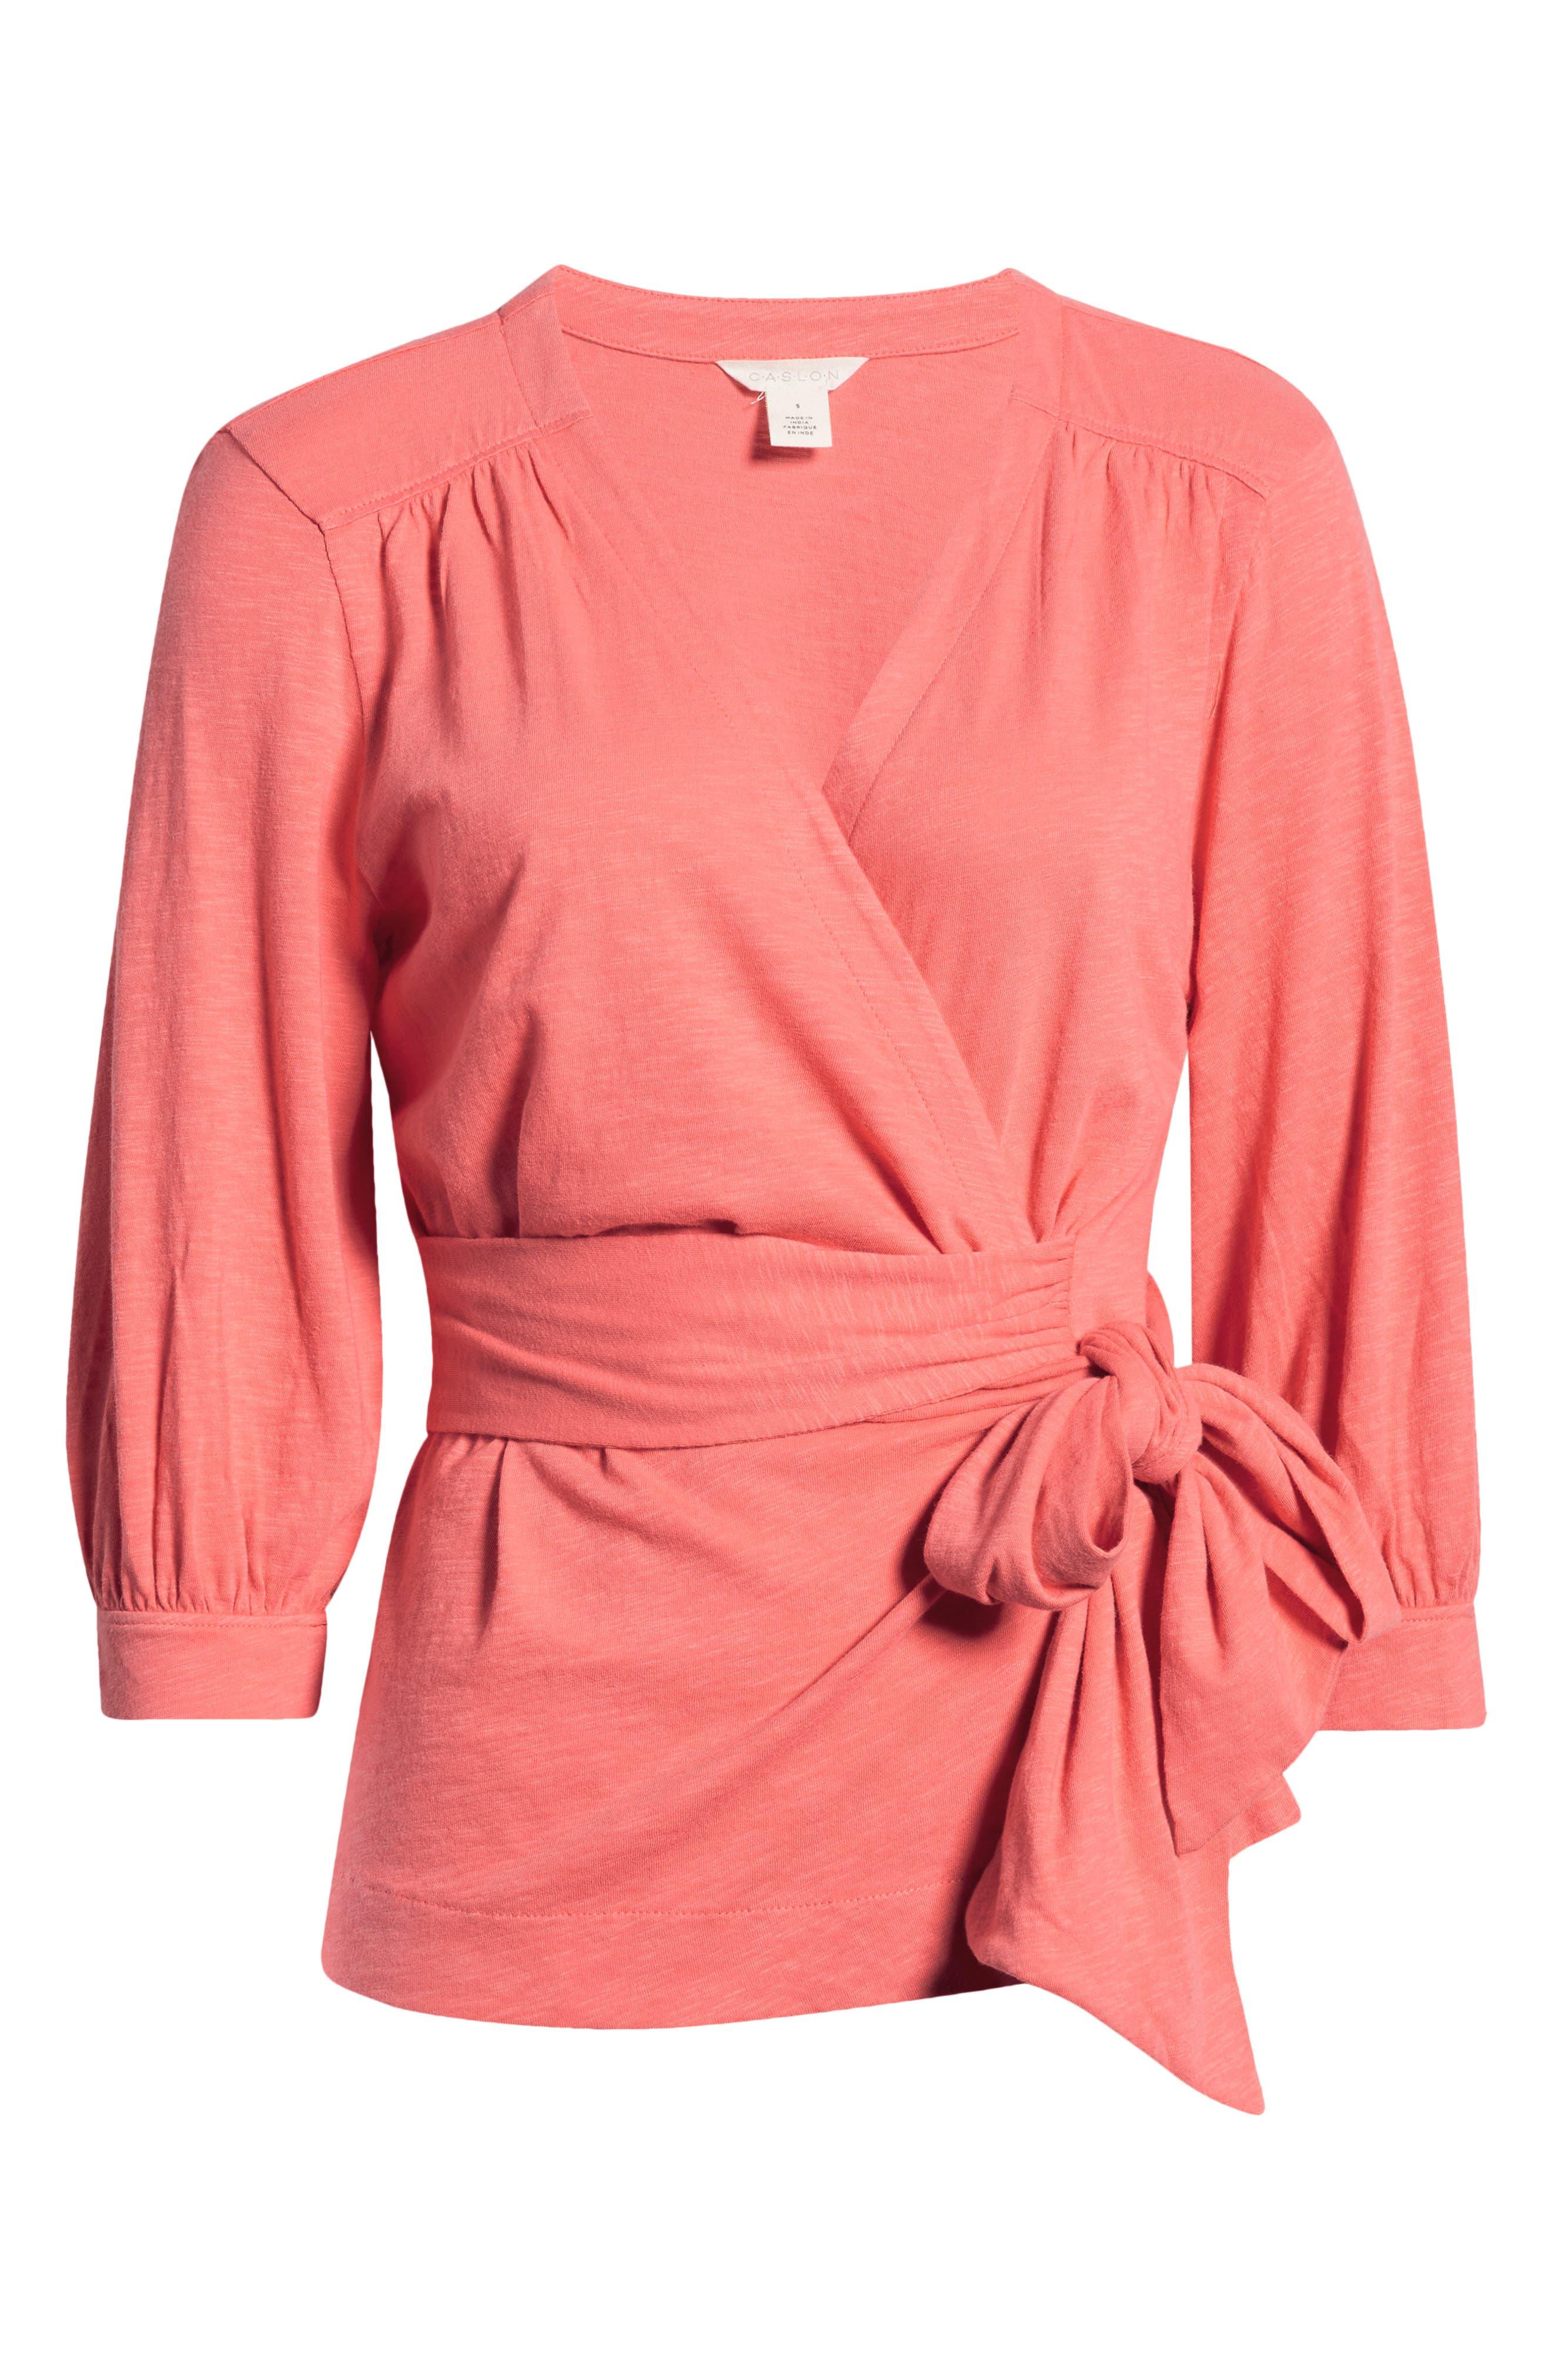 Women's Caslon Jersey Wrap Top